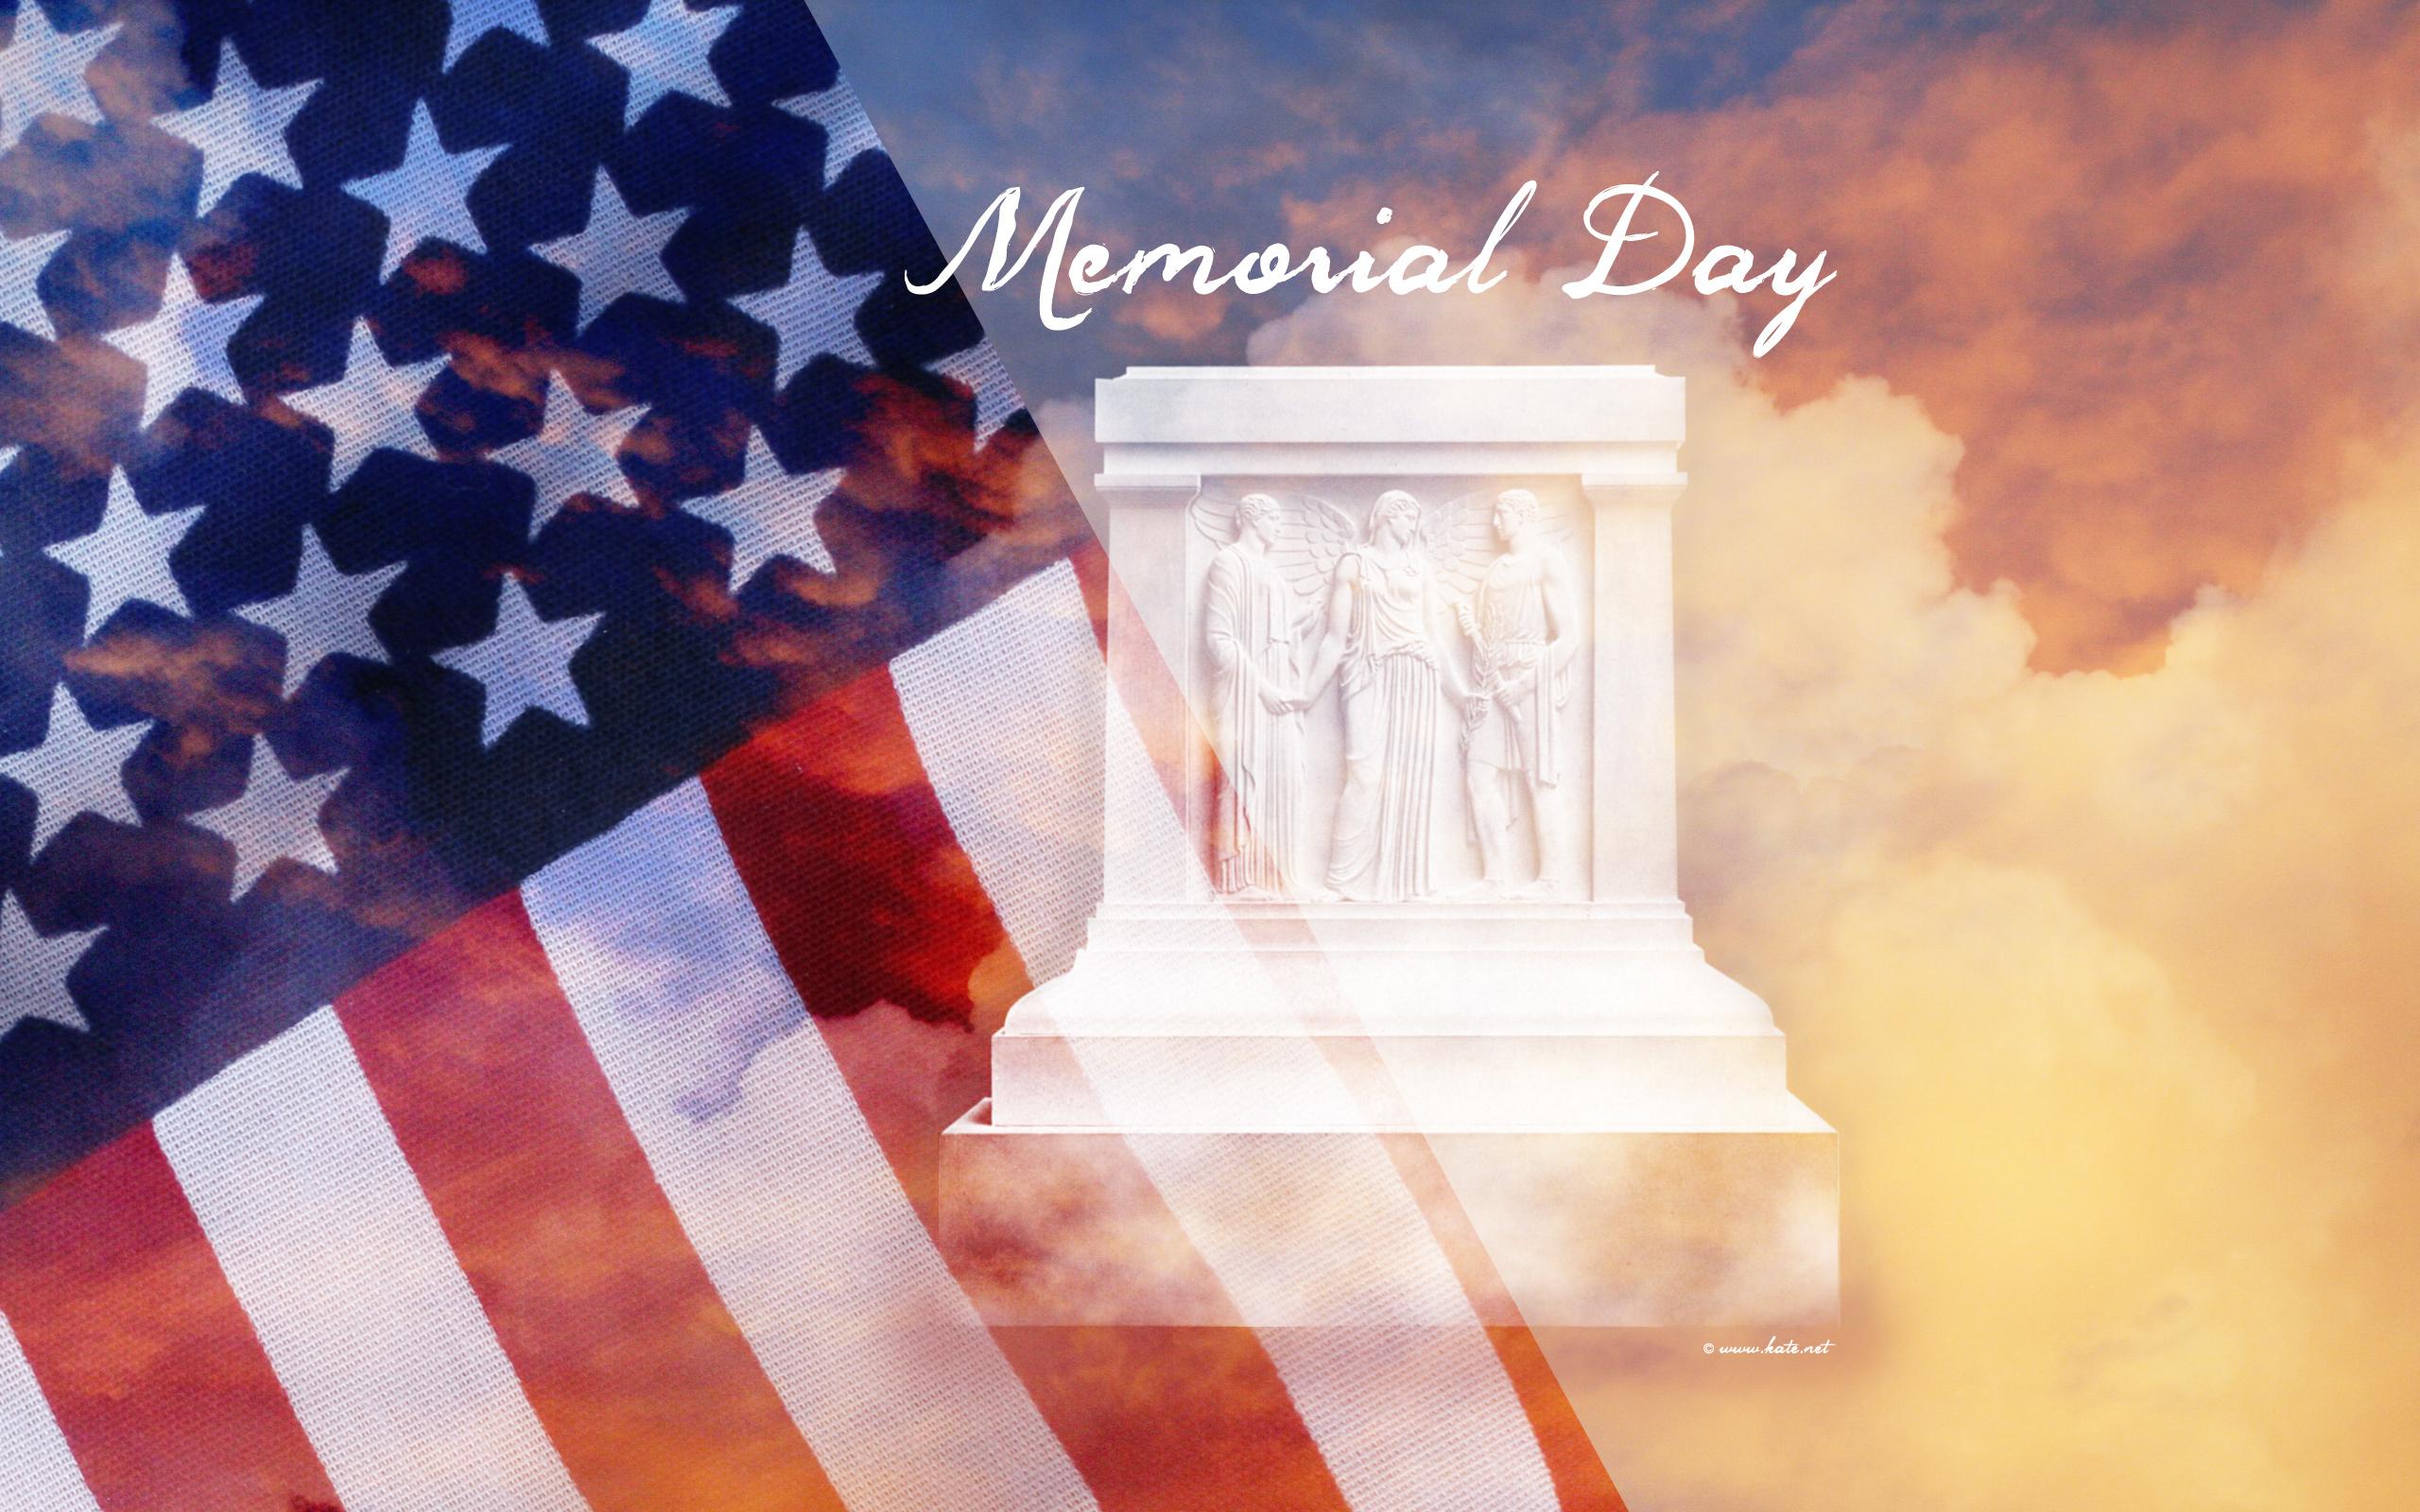 Memorial Day Computer Wallpaper